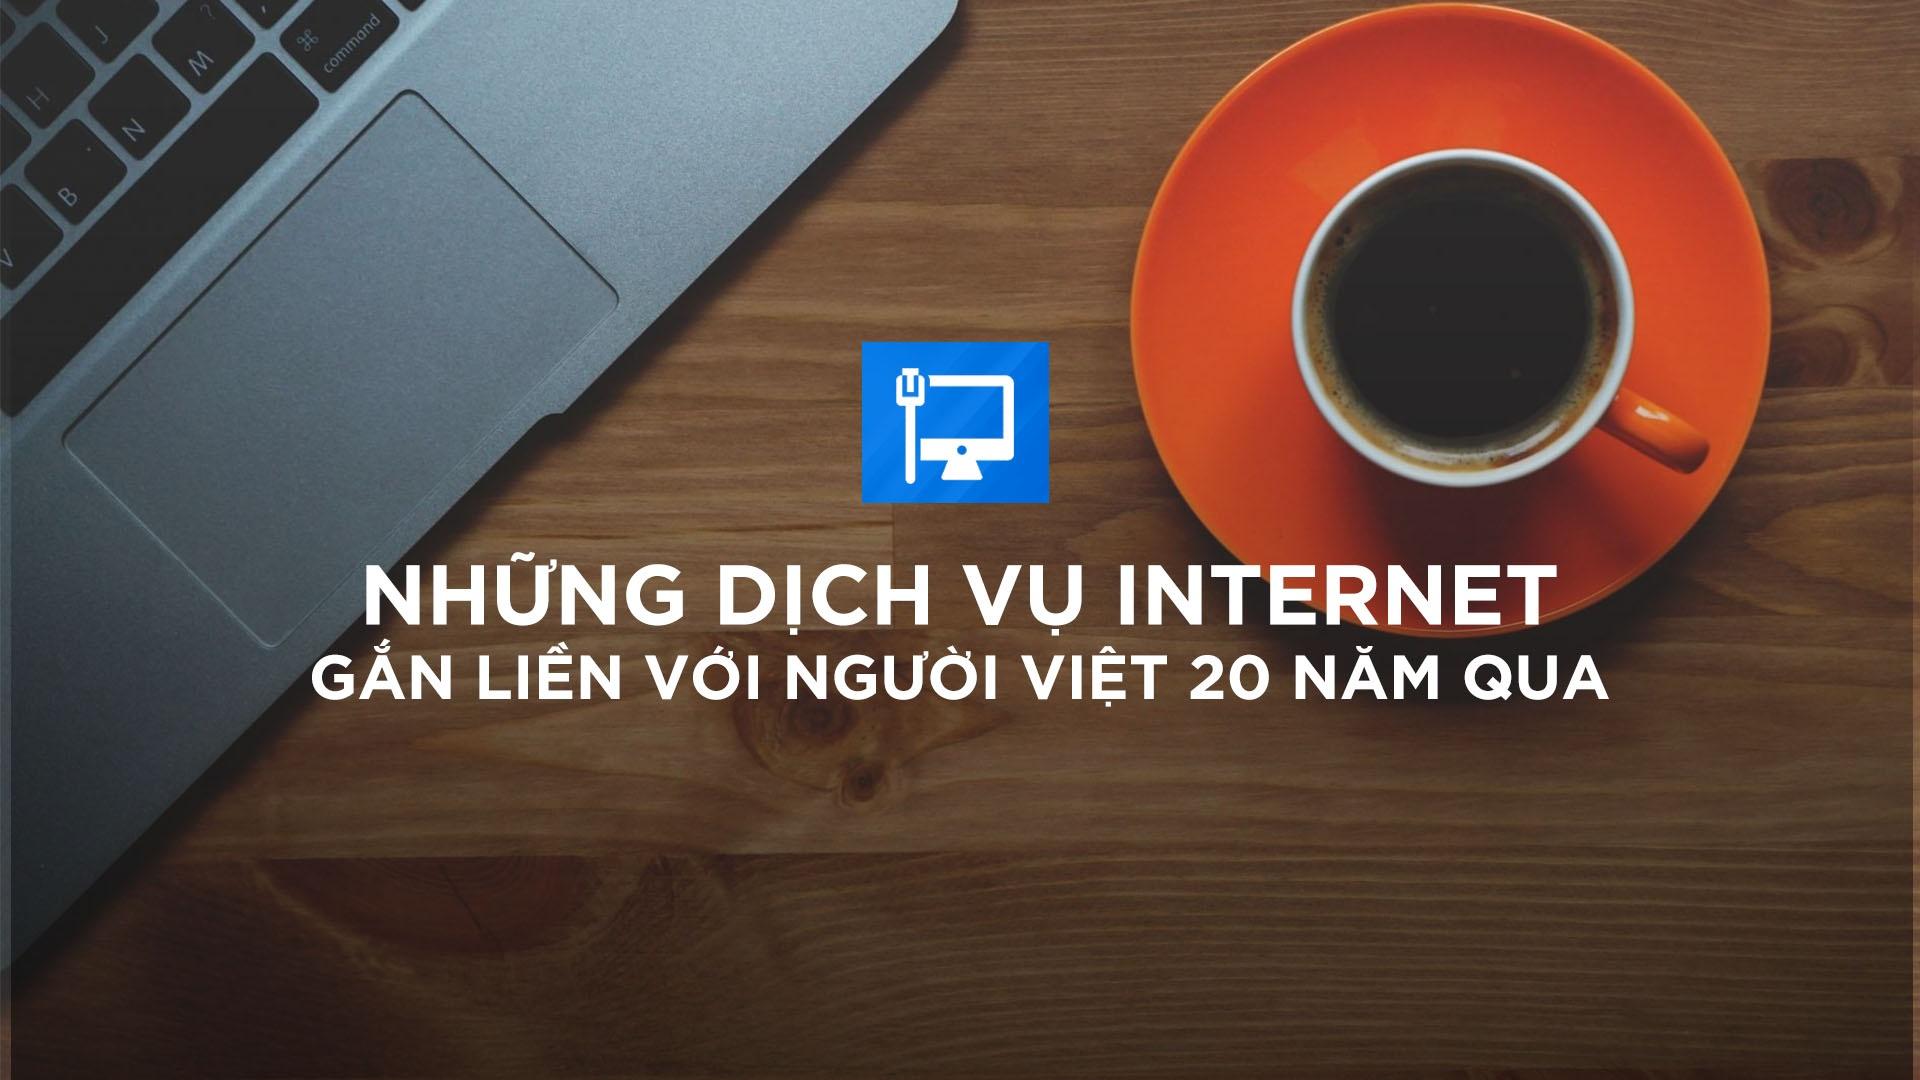 20 nam Internet Viet Nam anh 1